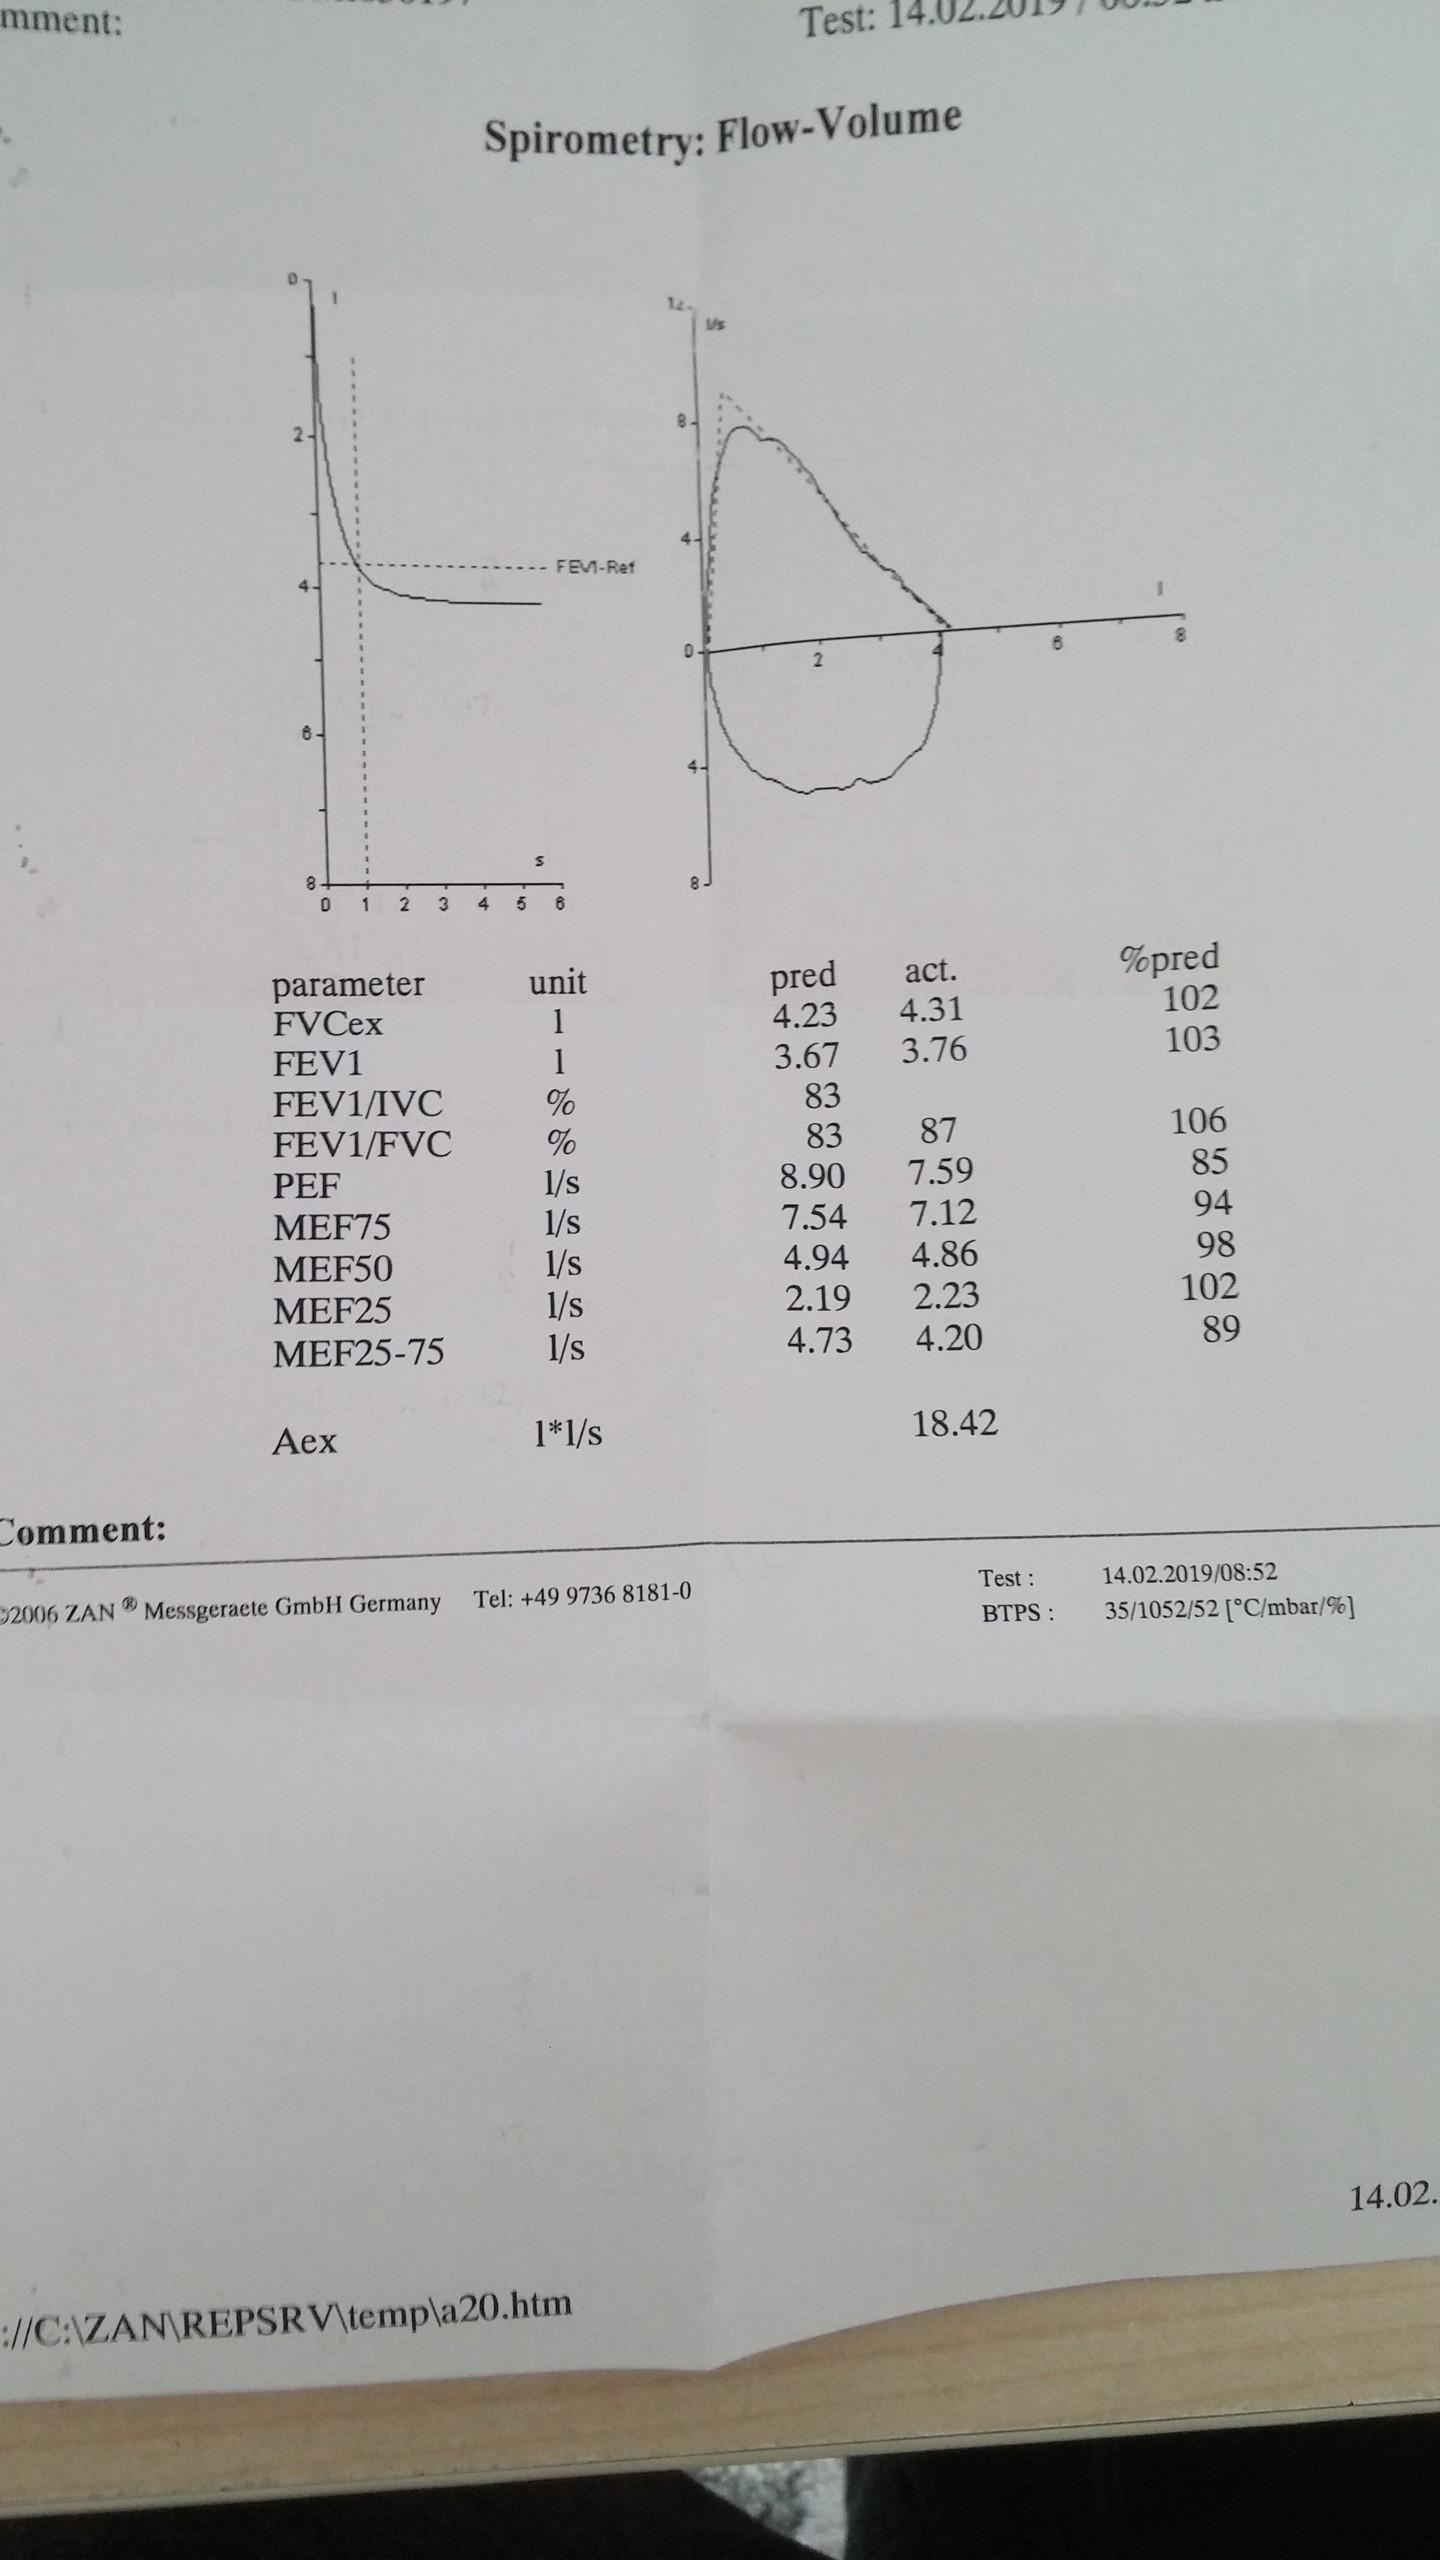 grB8A0 - Doktor astım dedi. SFT sonucunu yorumlar mısınız?